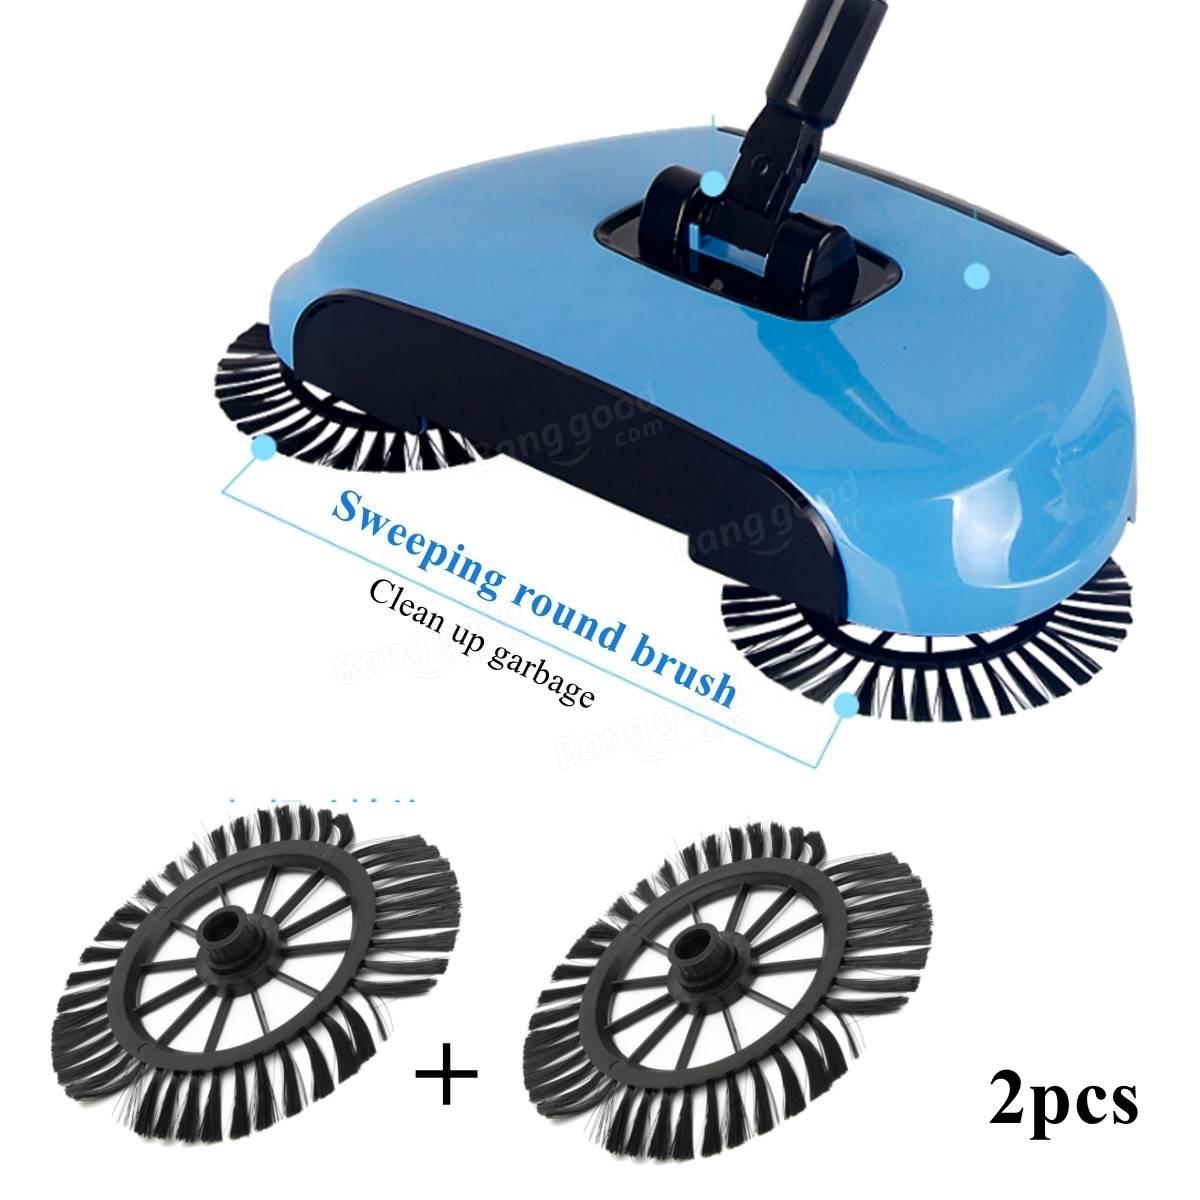 h2o mop instruction manual